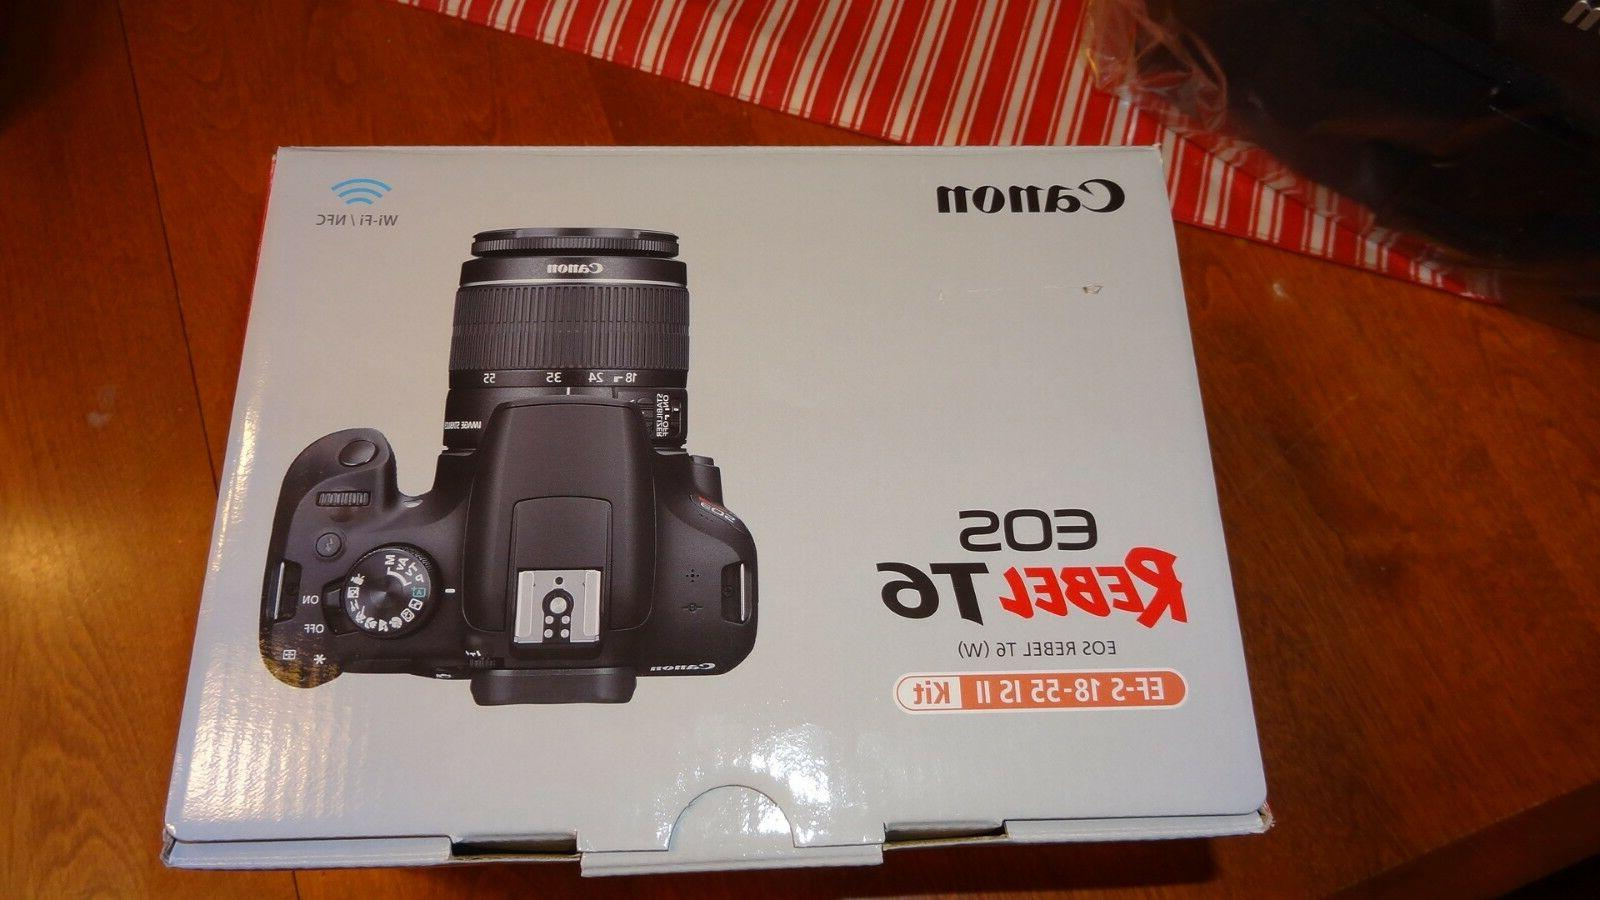 New Canon EOS Rebel Camera w/18-55mm Lens Bag